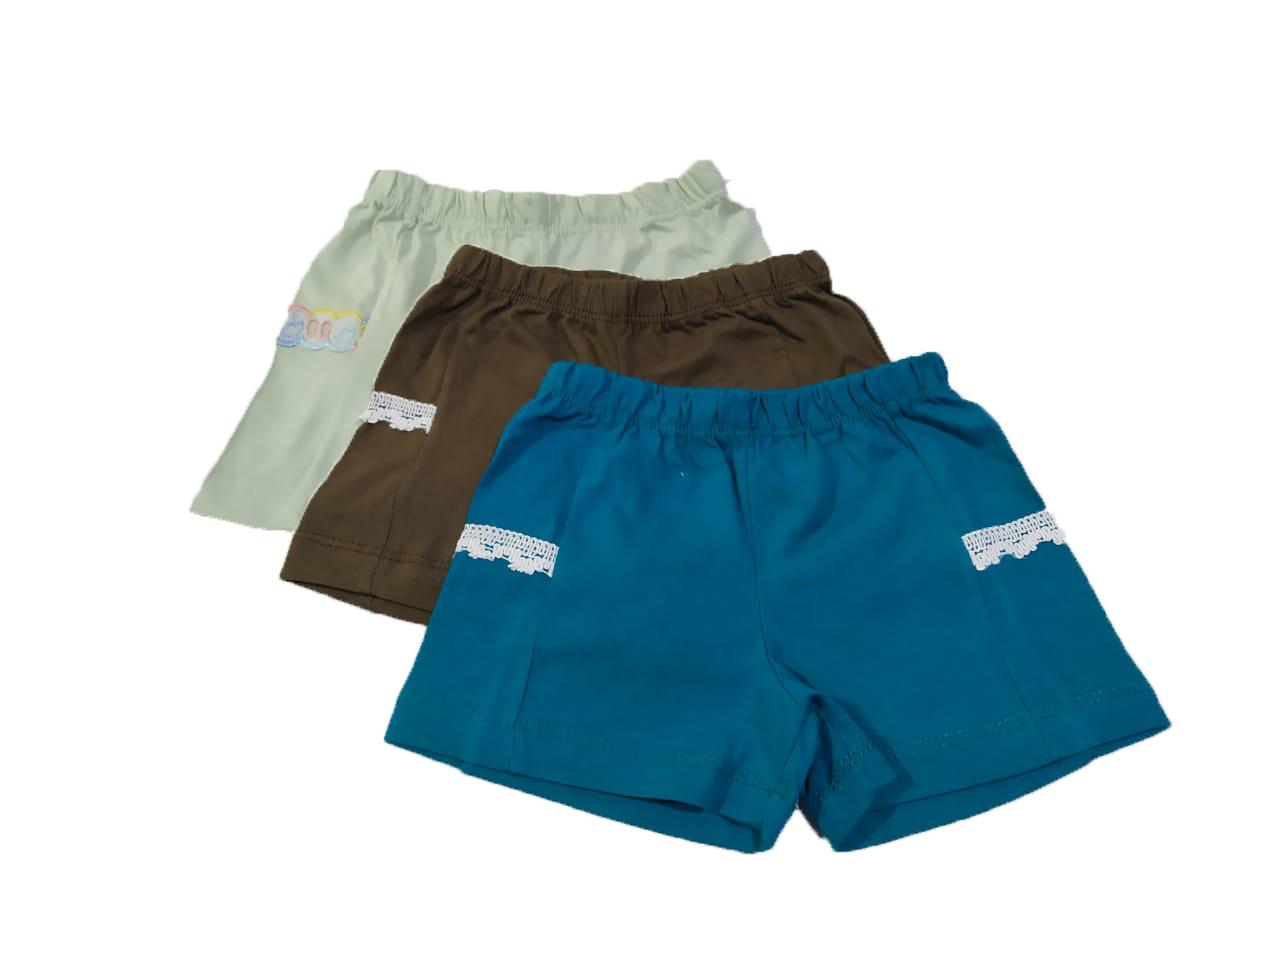 Kit 10 Shorts Bebê Menina Infantil 100% Algodão Atacado  - HF | High Flight